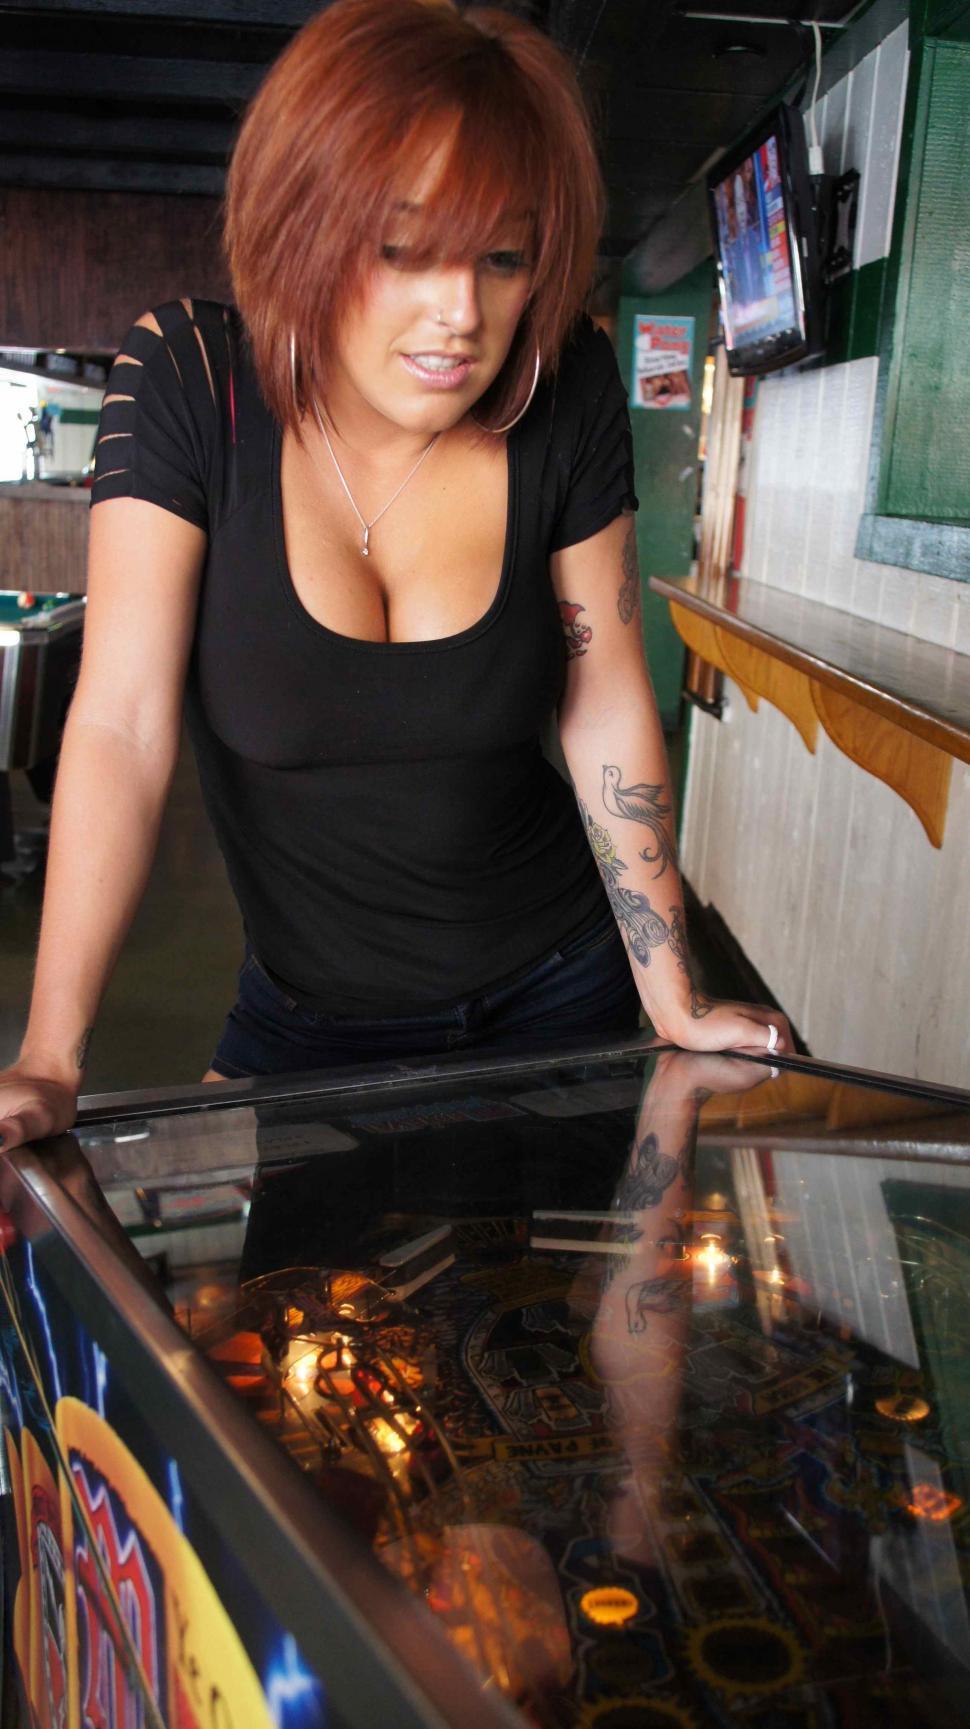 Download Free Stock Photo of Woman Playing Pinball